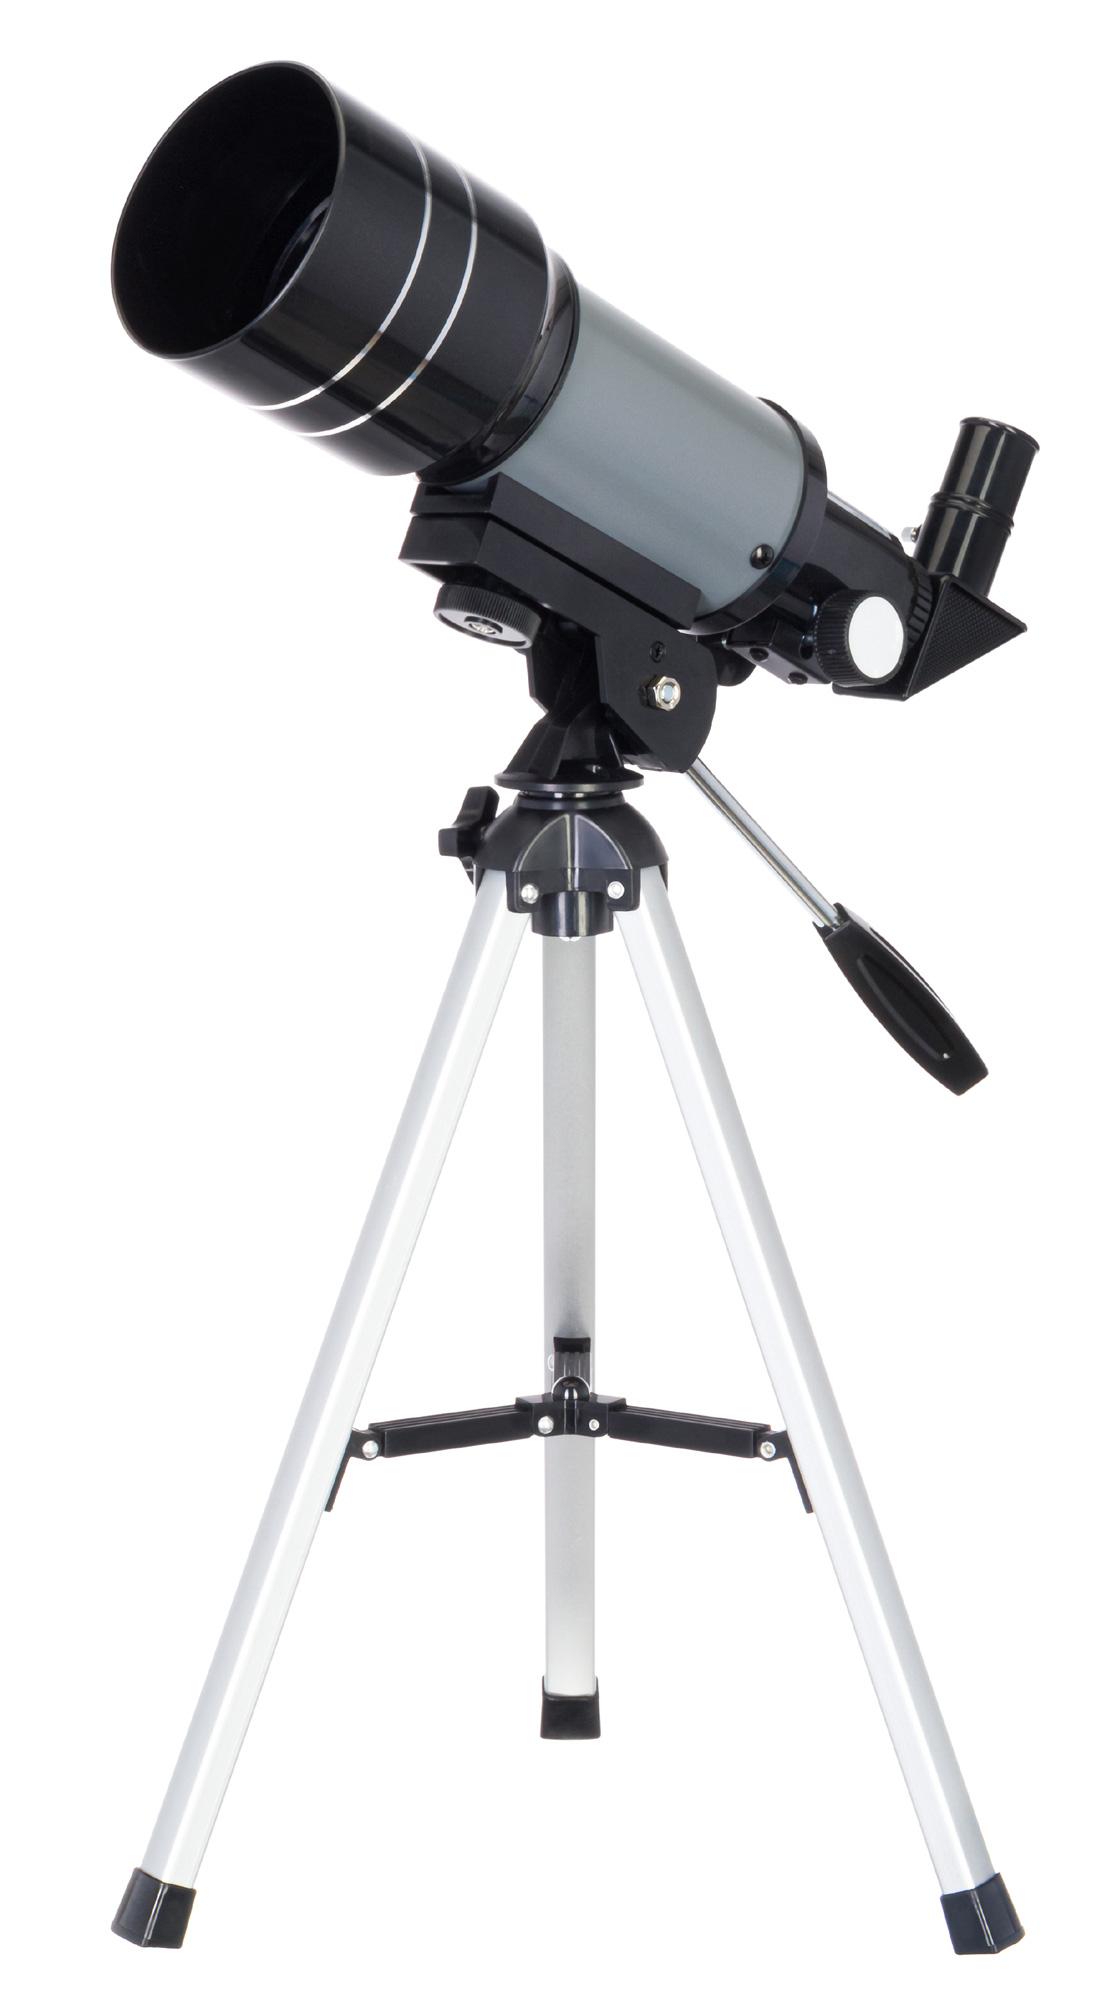 Картинка для Телескоп Levenhuk (Левенгук) Blitz 70s BASE